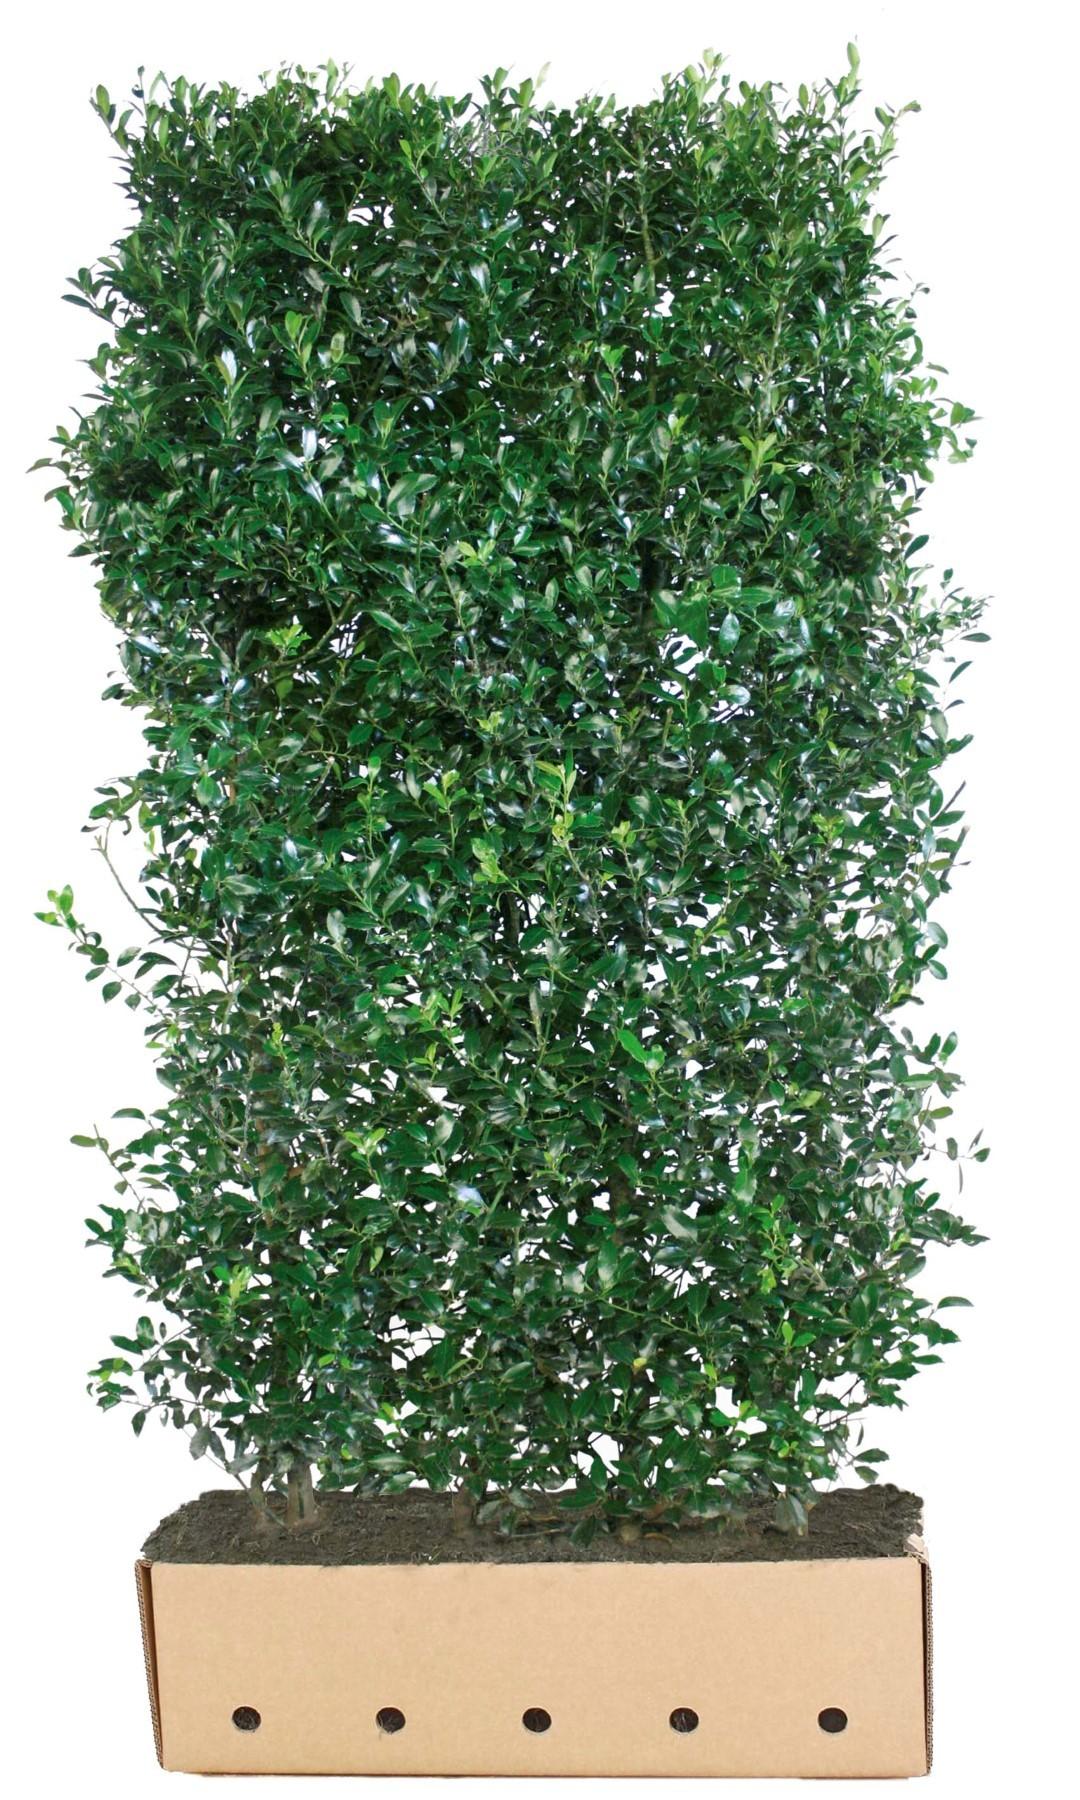 Kant & klaar haag Ilex aquifolium Siberia Limsi 200 x 100 cm breed